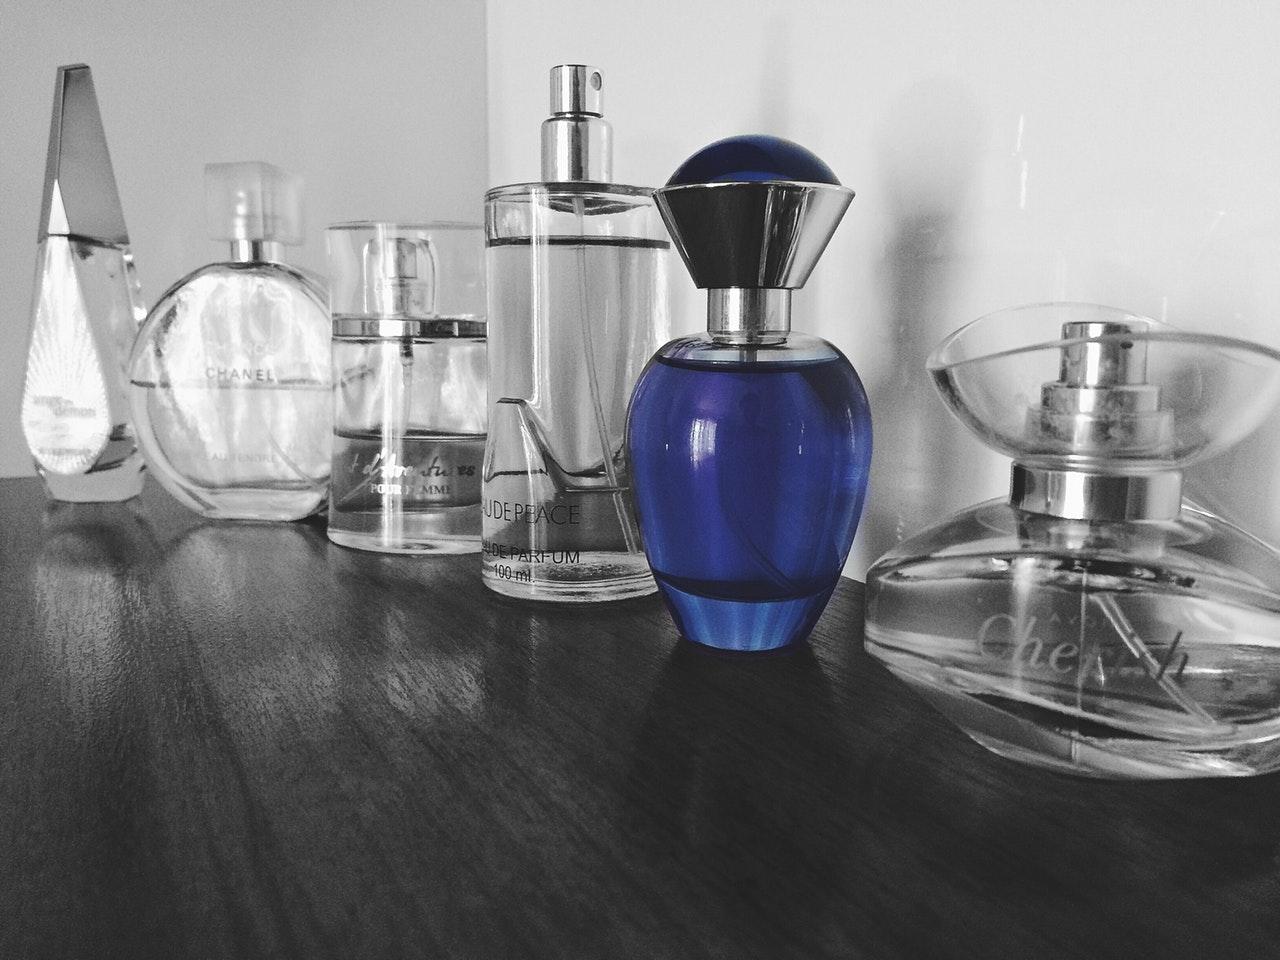 Fragrance bottles on wooden surface